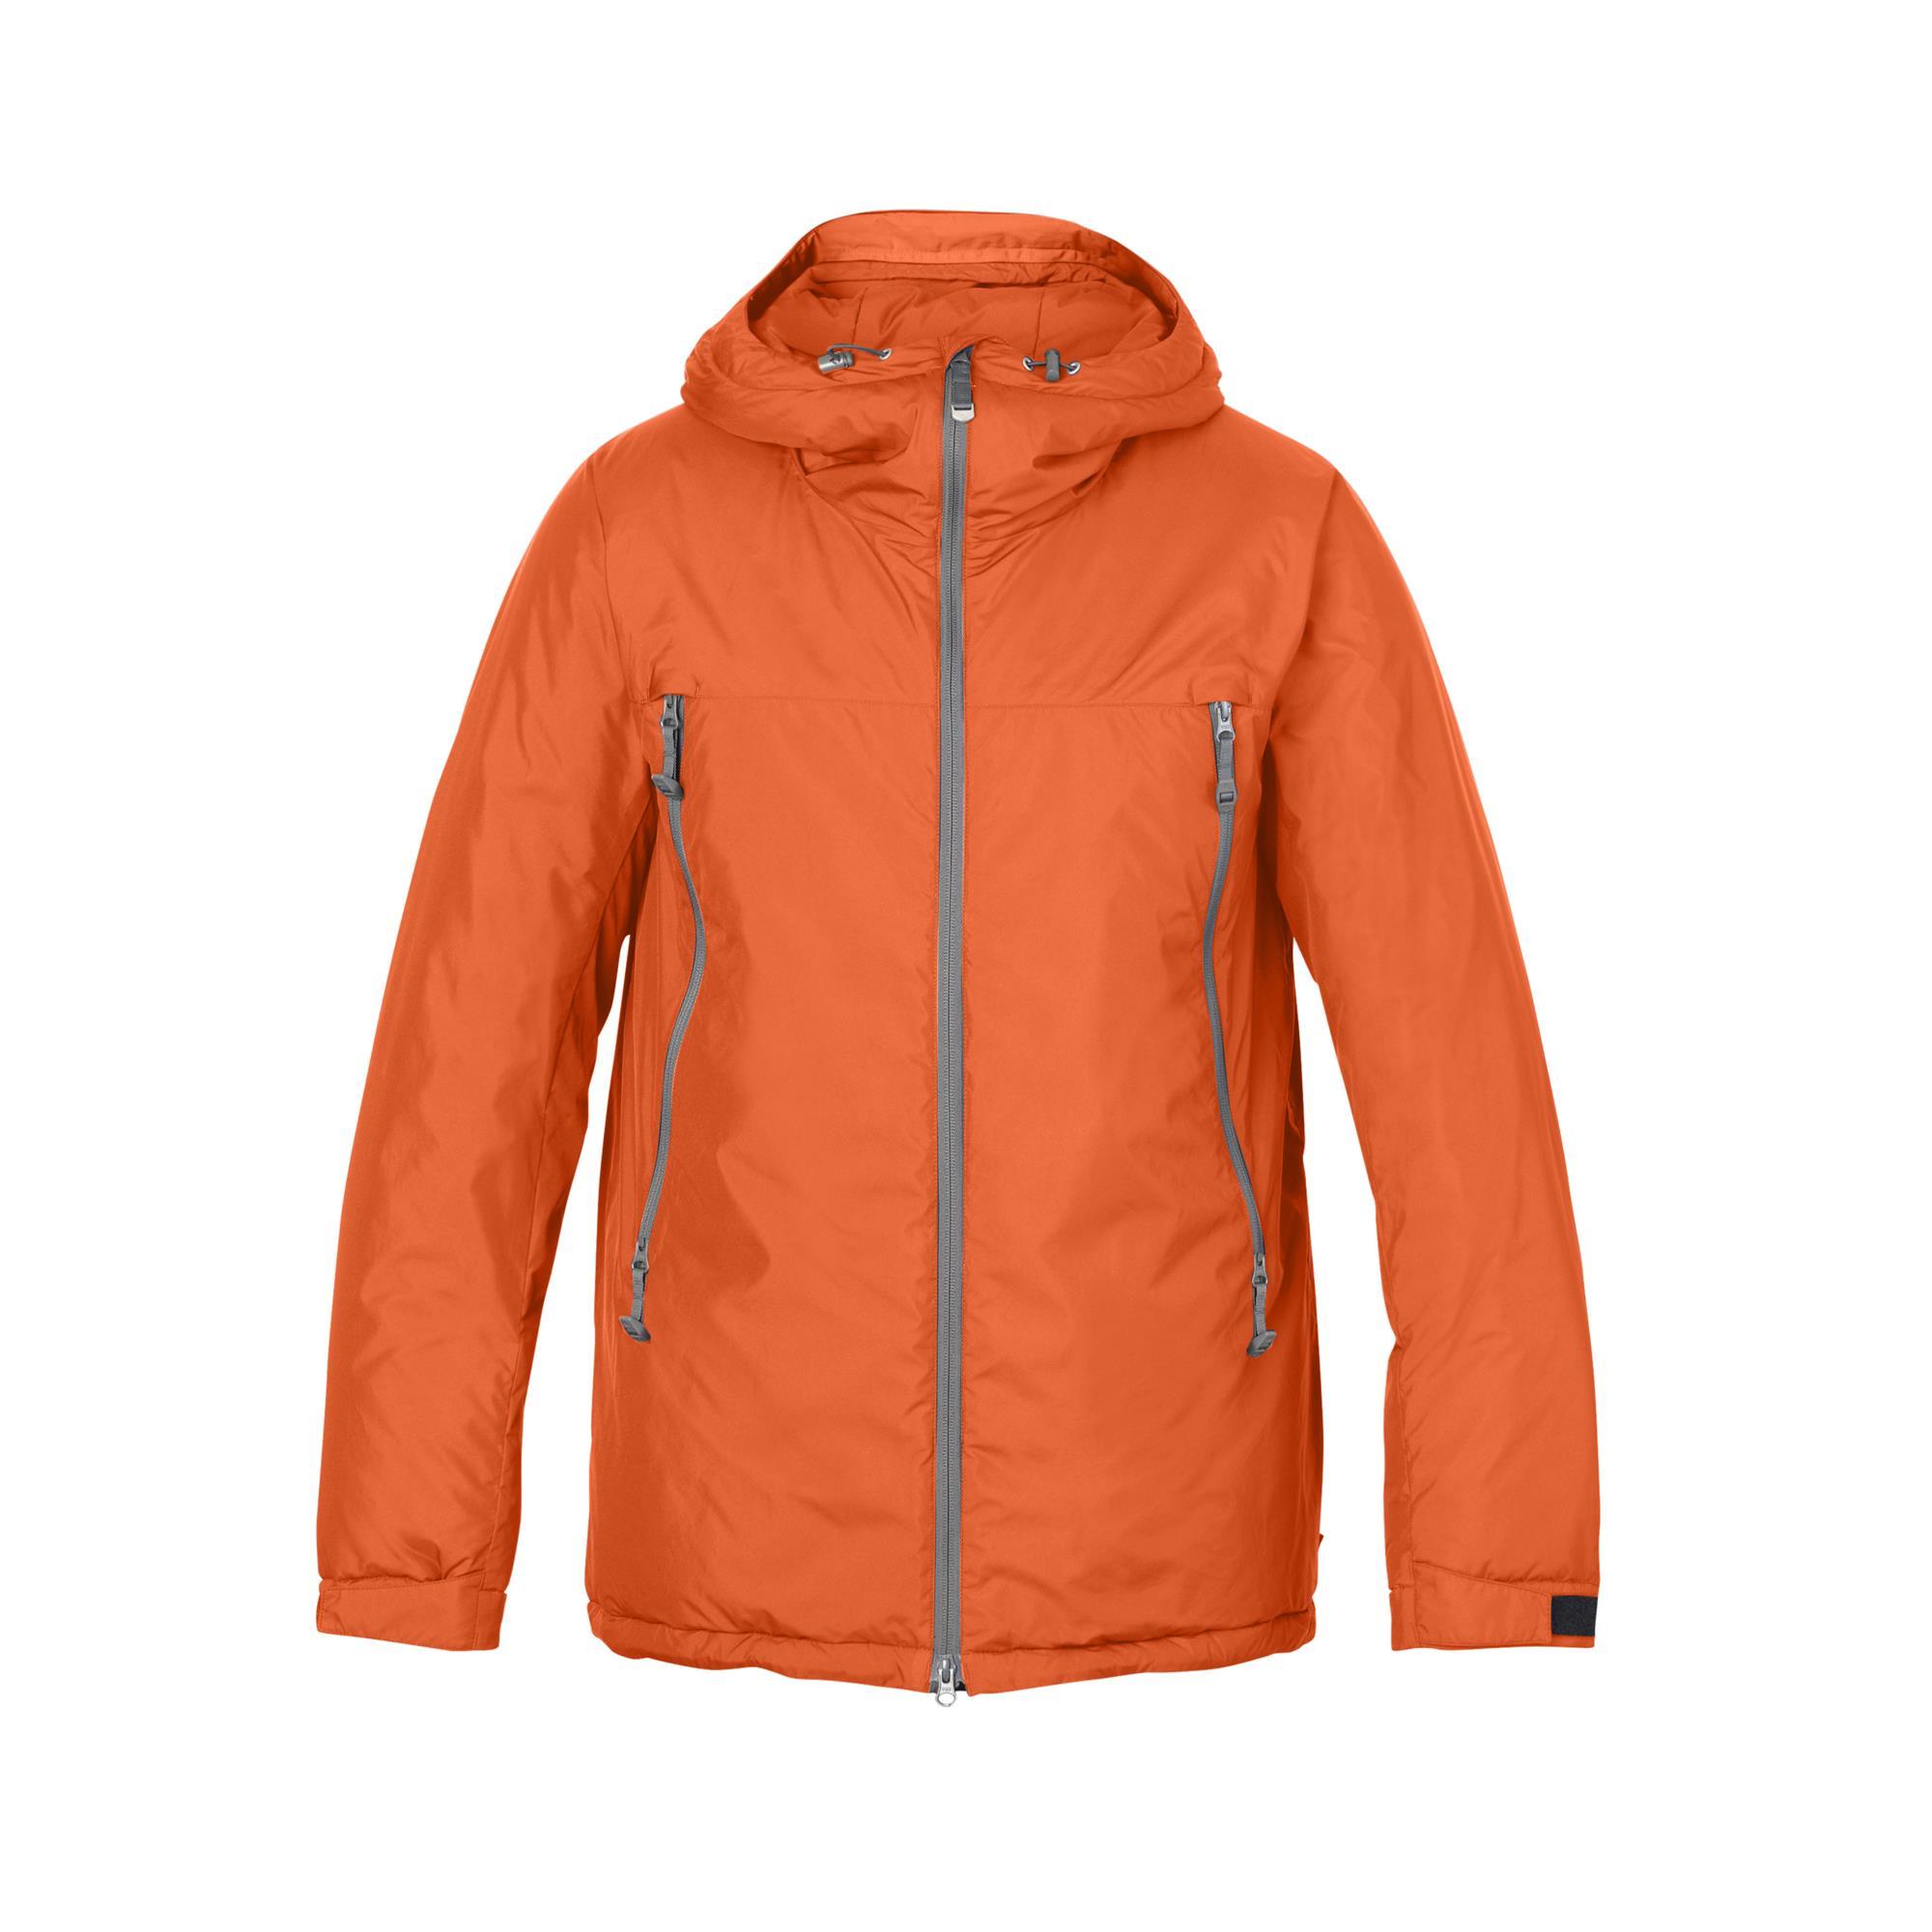 Fjällräven Bergtagen Insulation Jacket Winterjacke orange Herren